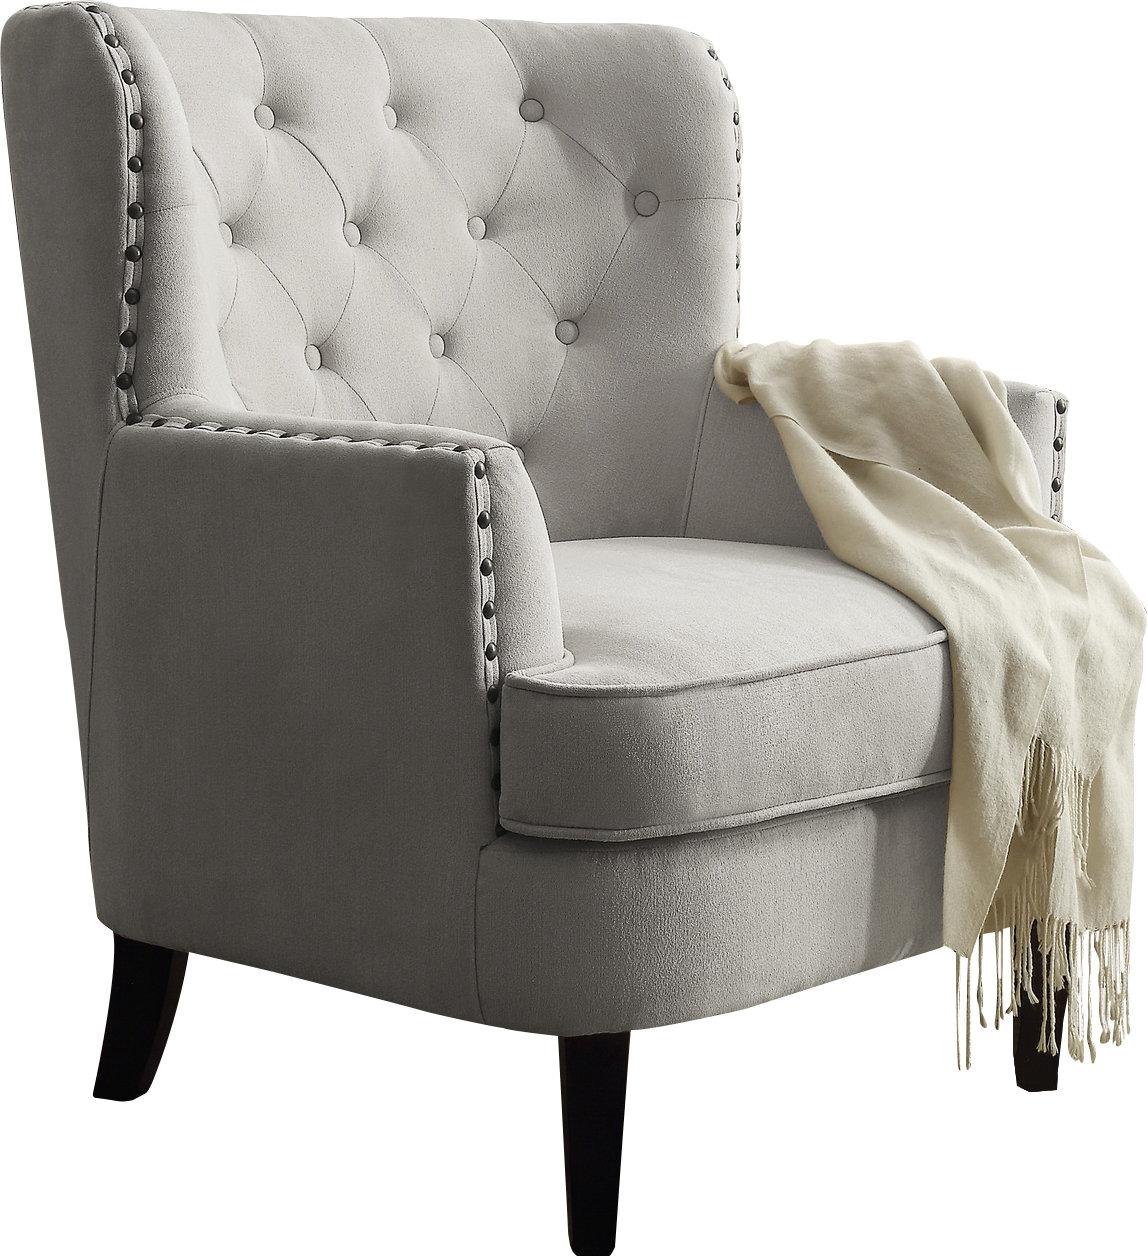 Wingback chair laurel foundry modern farmhouse ivo wingback chair u0026 reviews   wayfair DAWKQVY